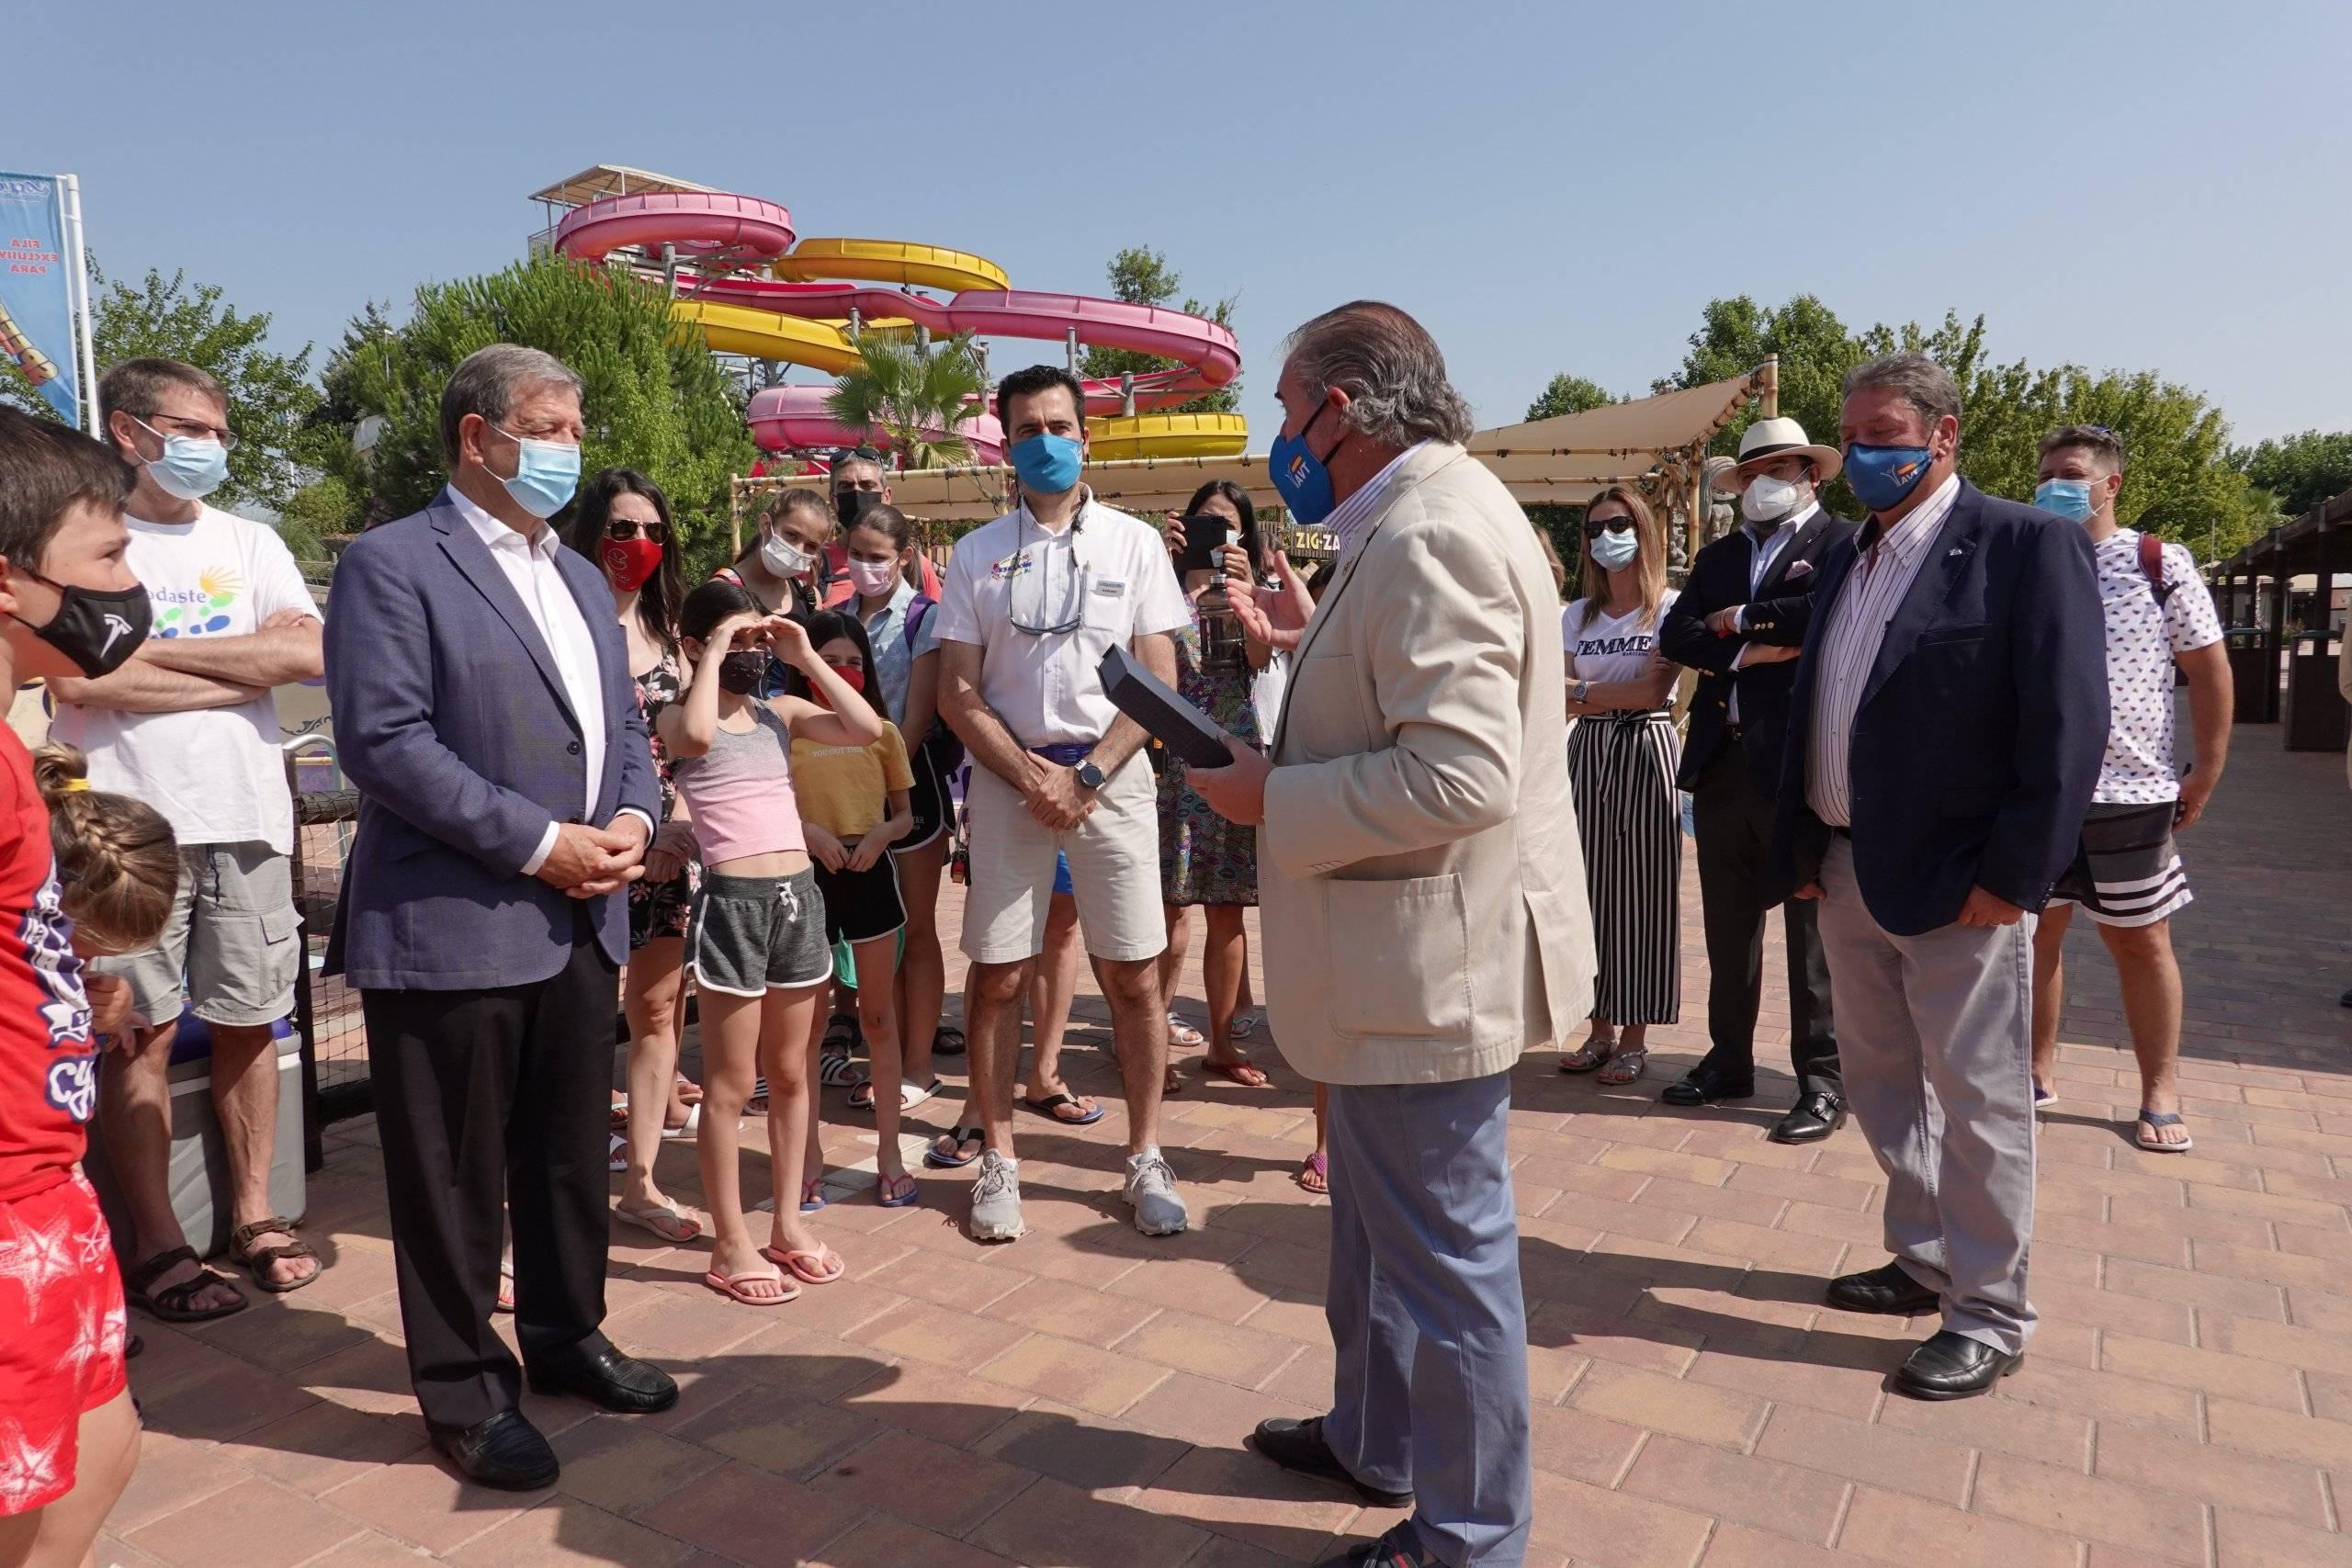 Momento de la entrega del galardón de la AVT al alcalde.